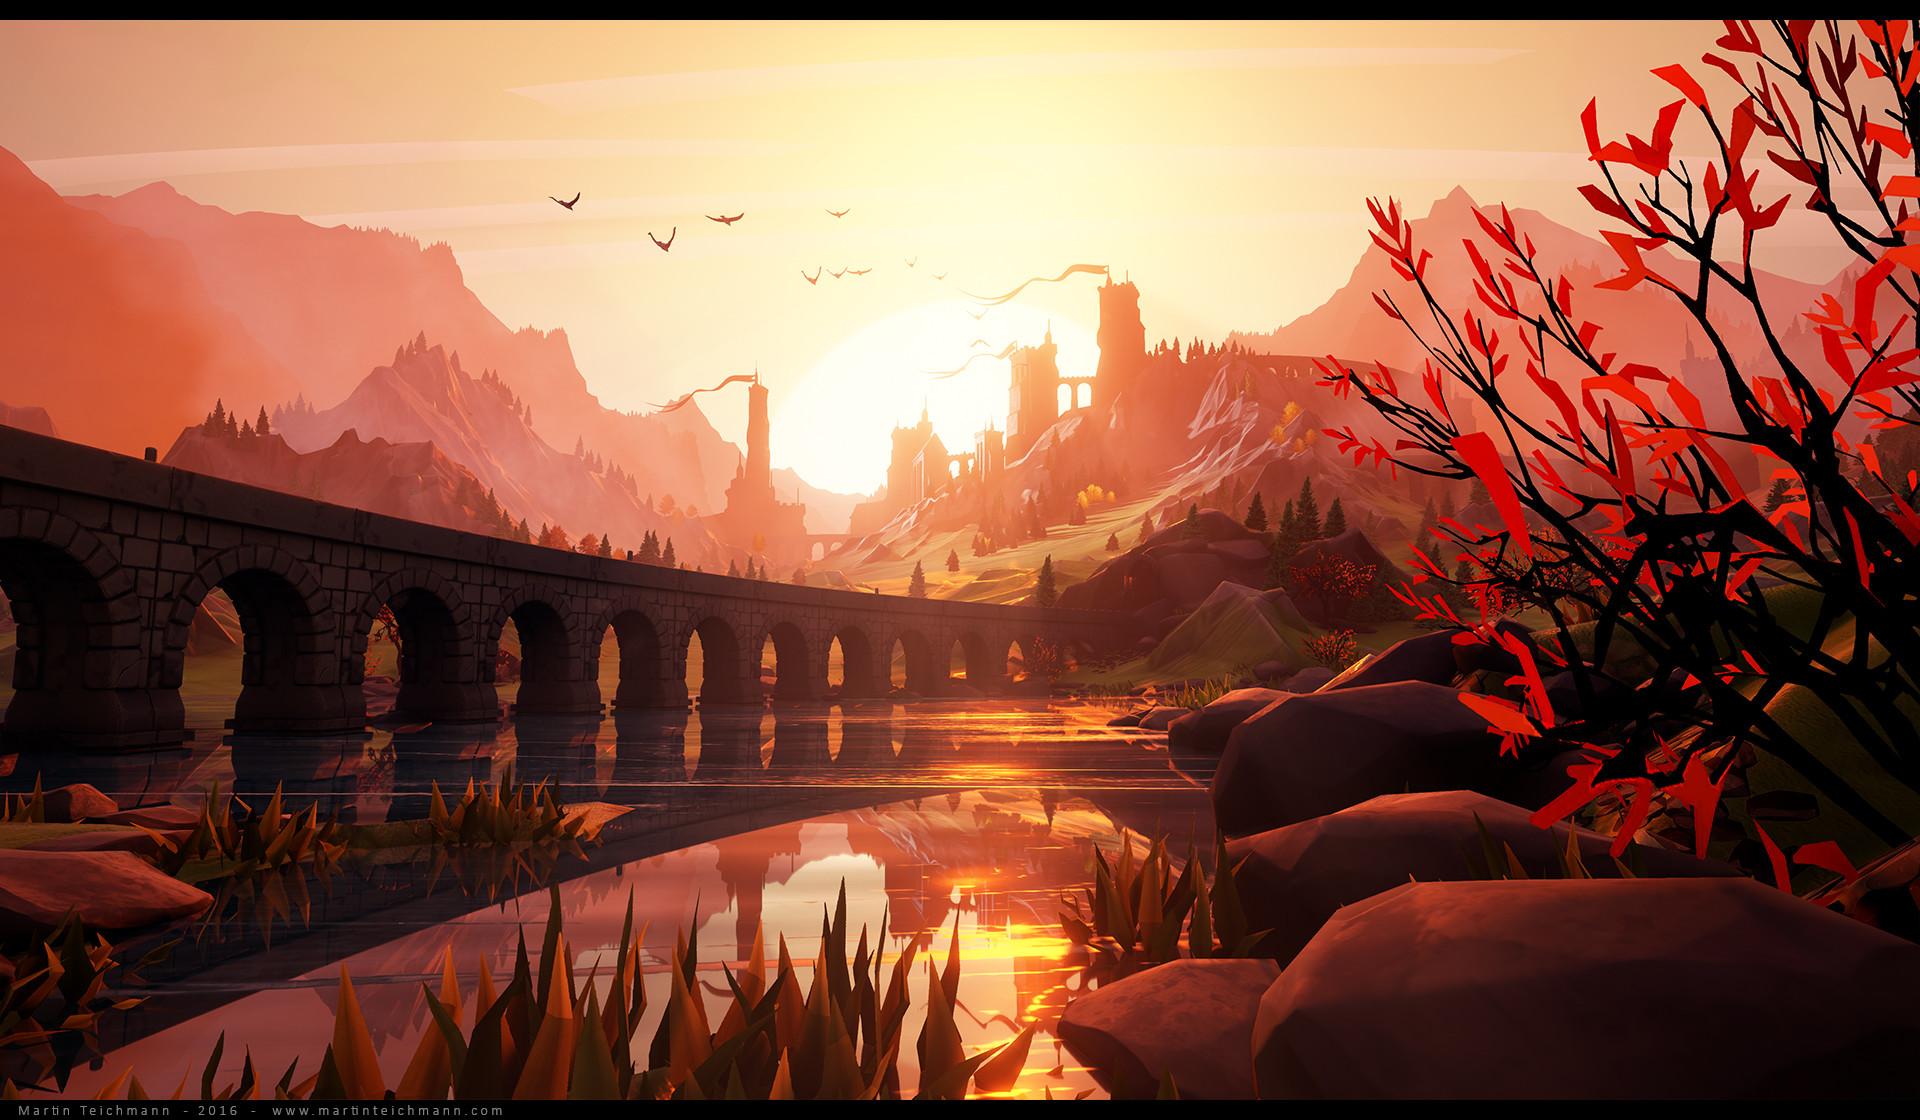 Martin teichmann sunrise landscape 03